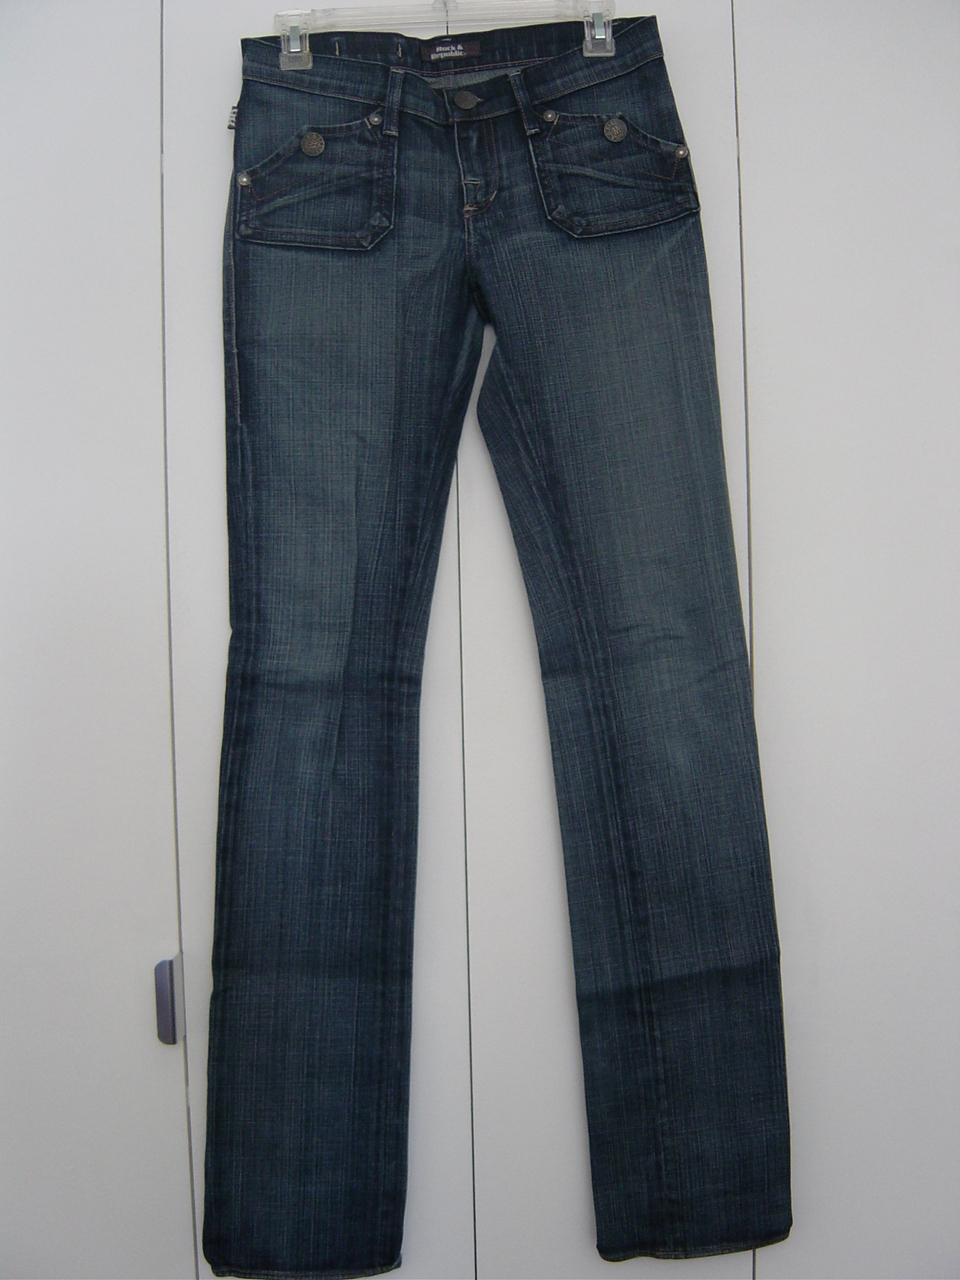 Rock & Republic Gwen Jeans in Prime (Size: 26)  EUC